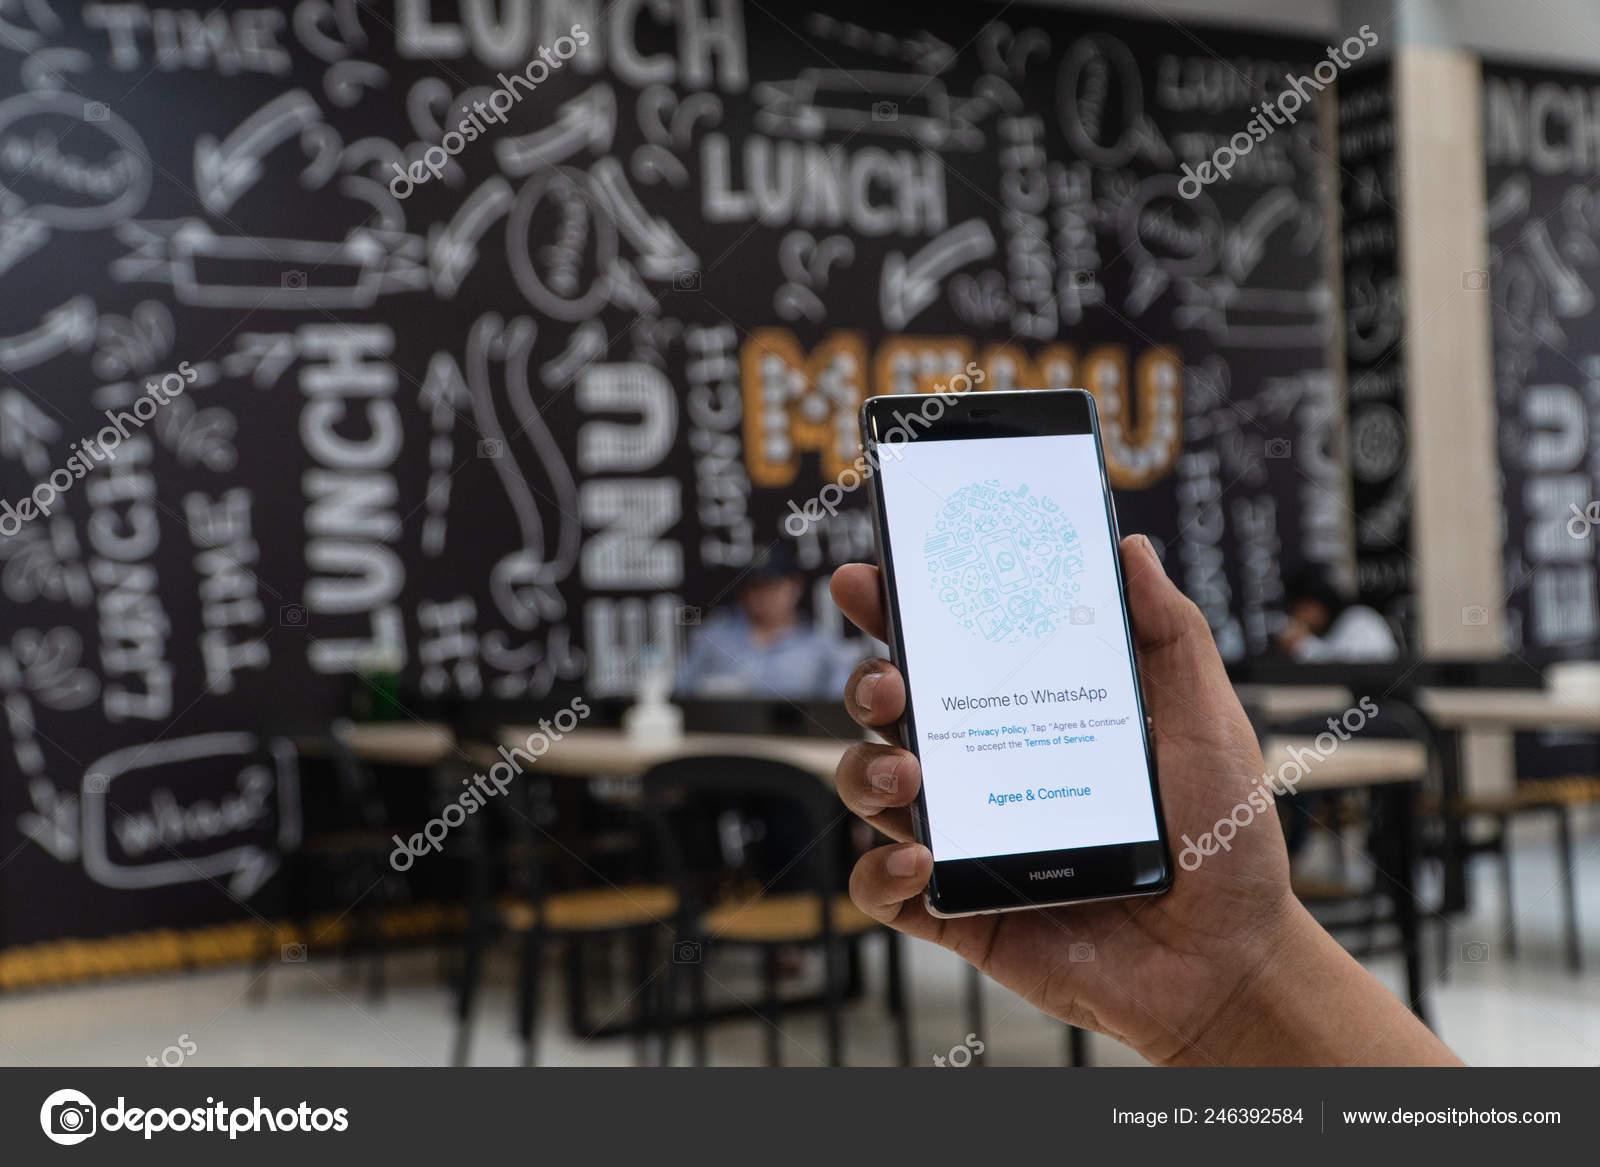 Chiang Mai Thailand Jan 2019 Man Holding Oneplus Whatsapp